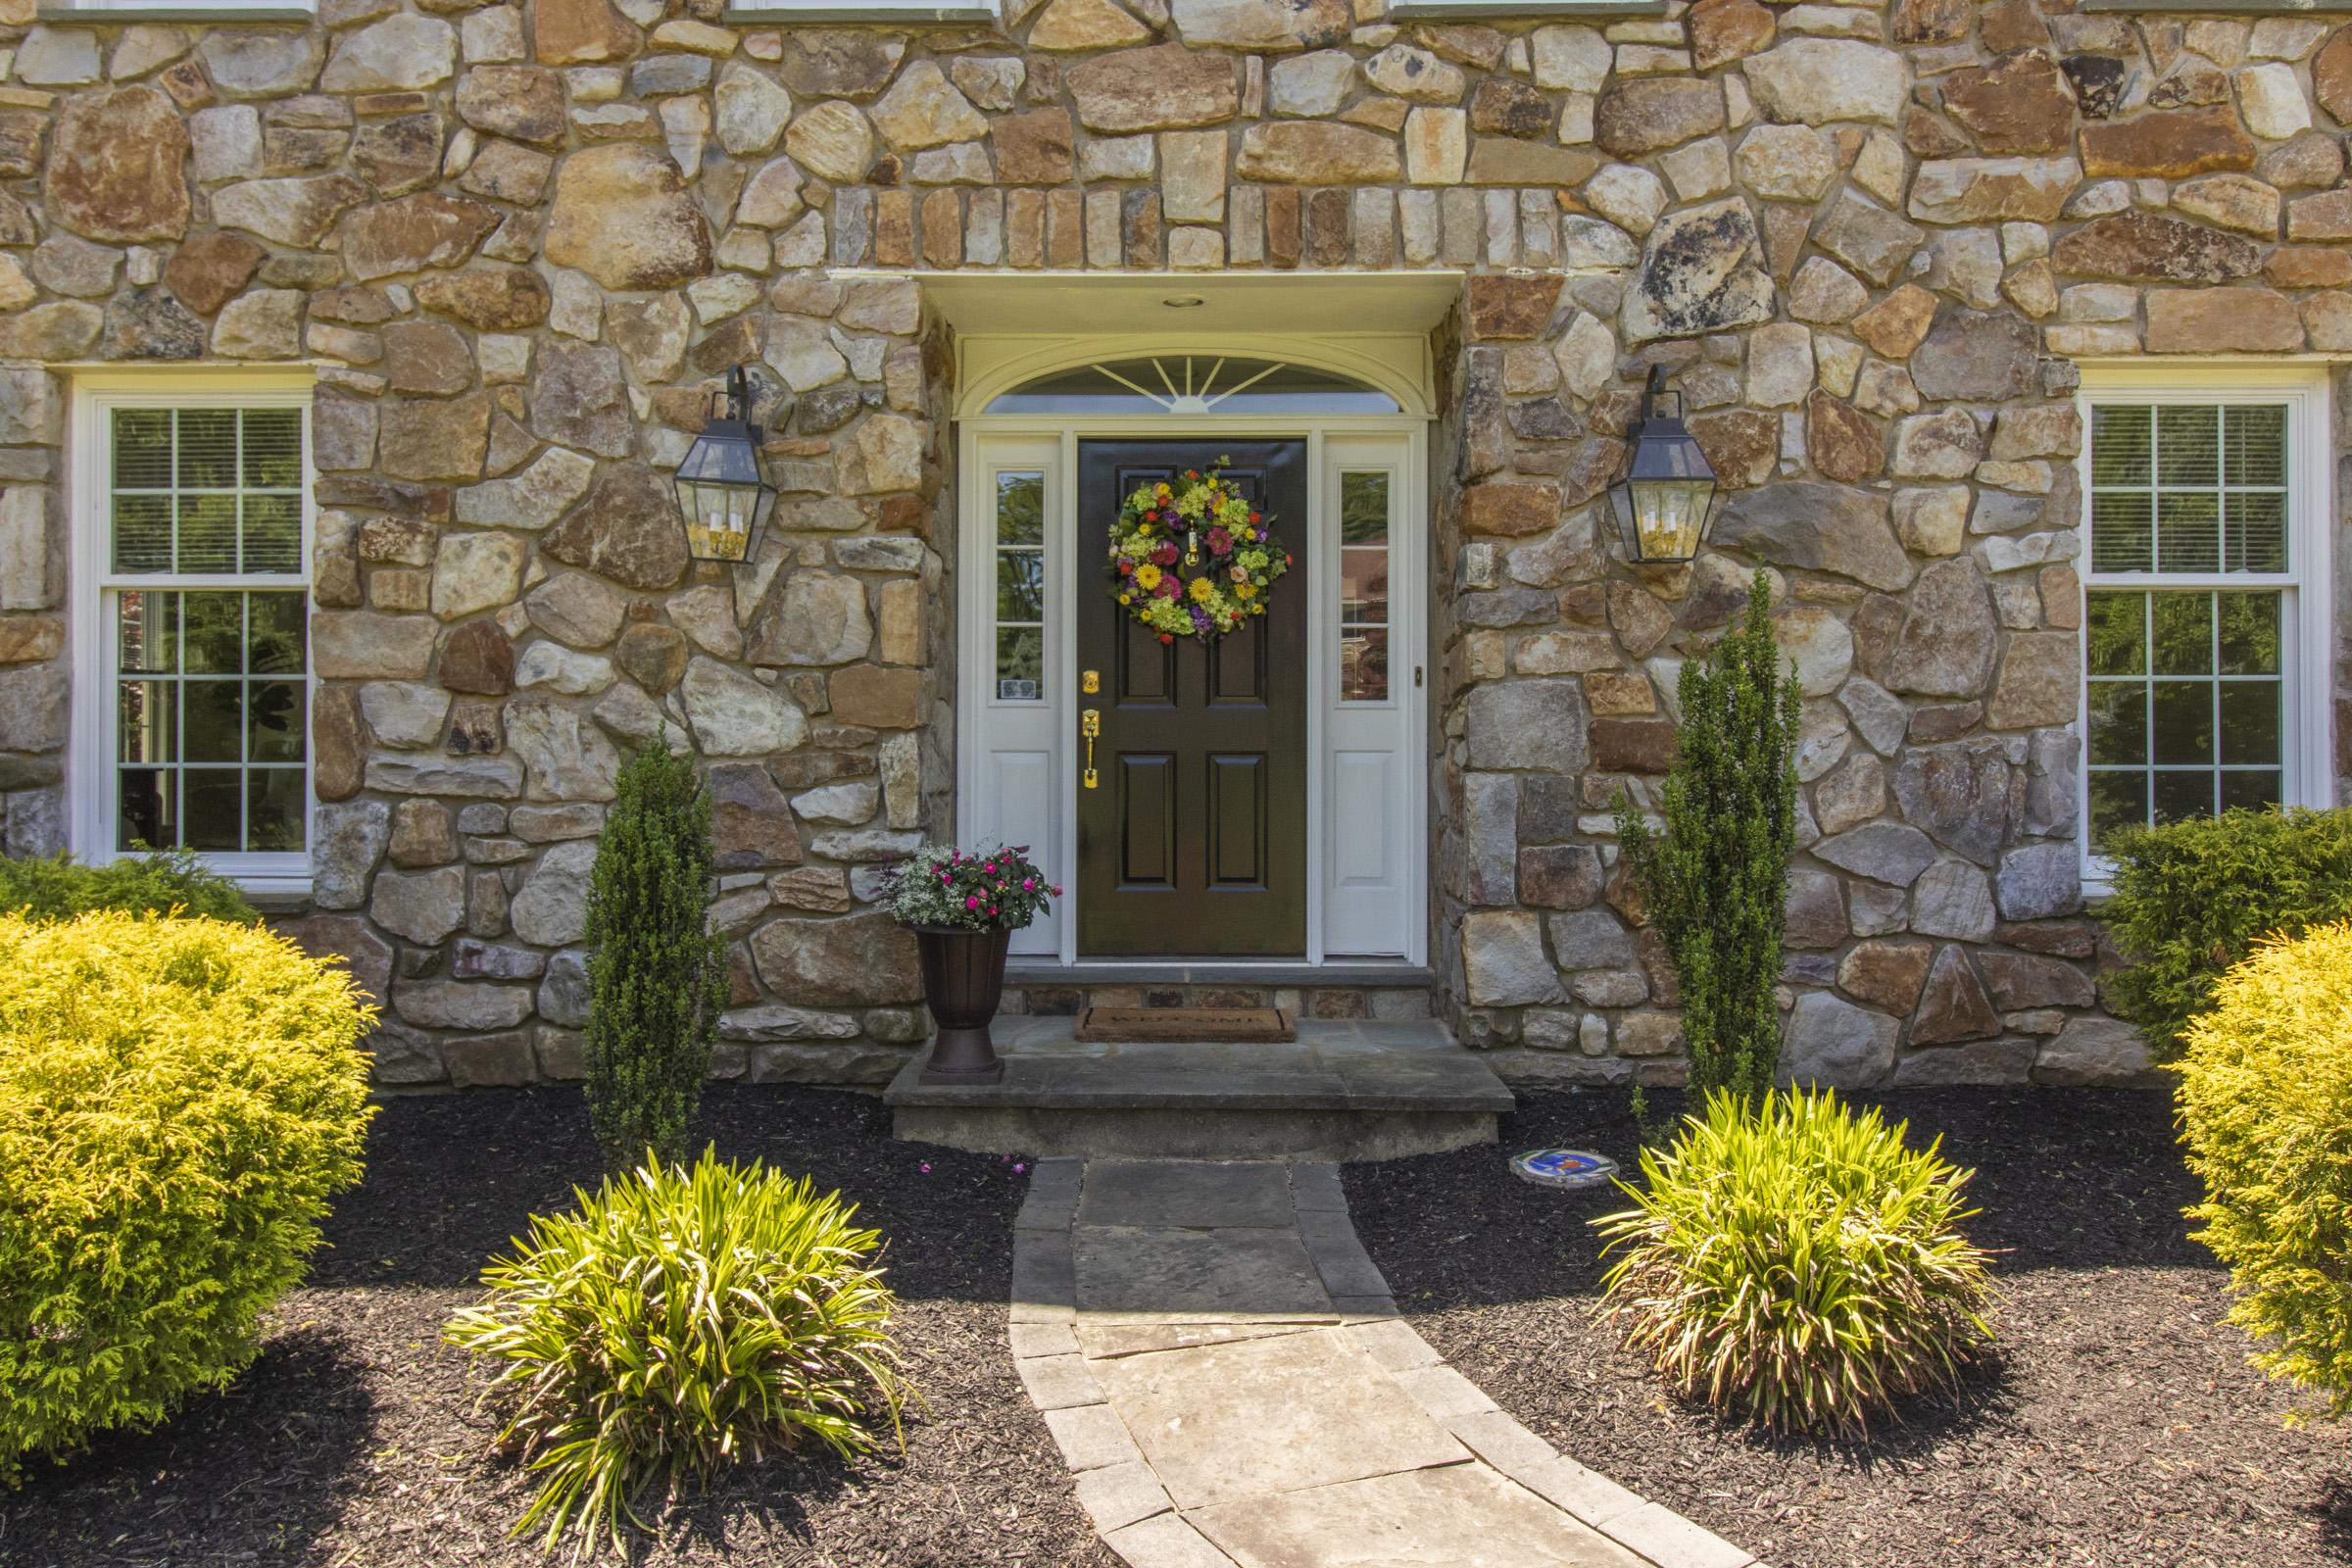 Post Covid-19 Pandemic - Home Buying Era